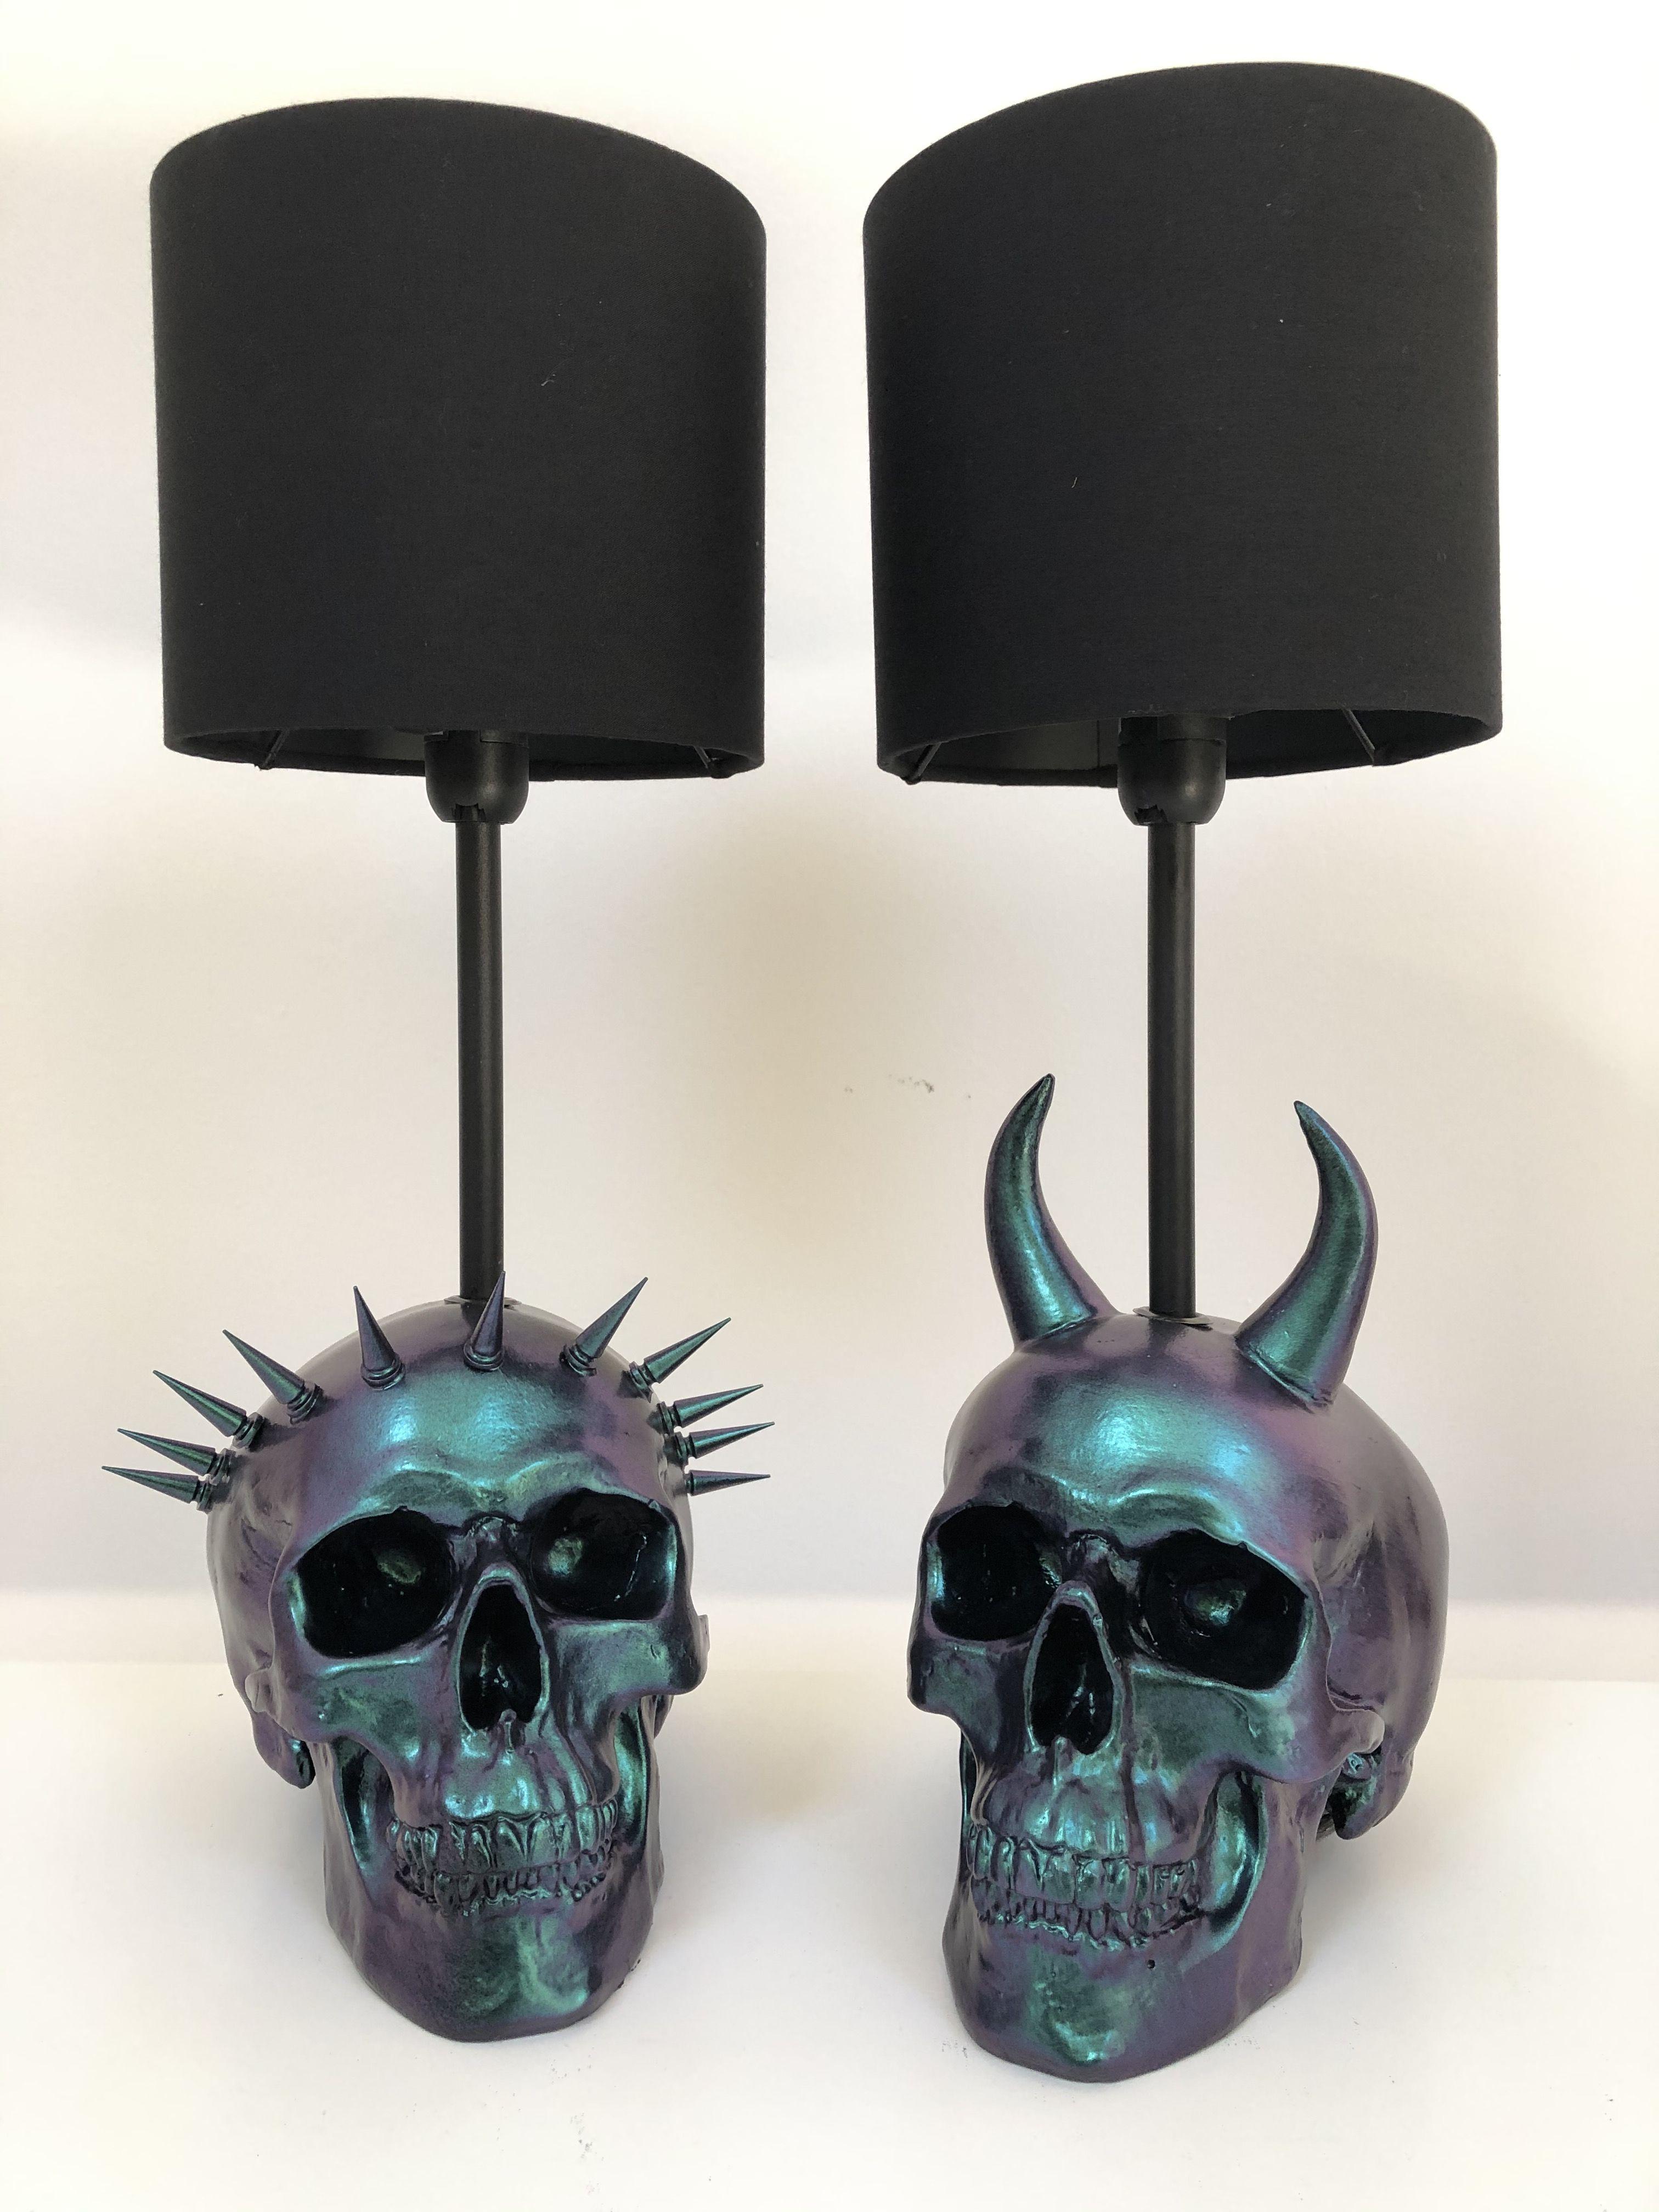 Liberty & Devil Colour Flip Skull Lamp - Skull Dec